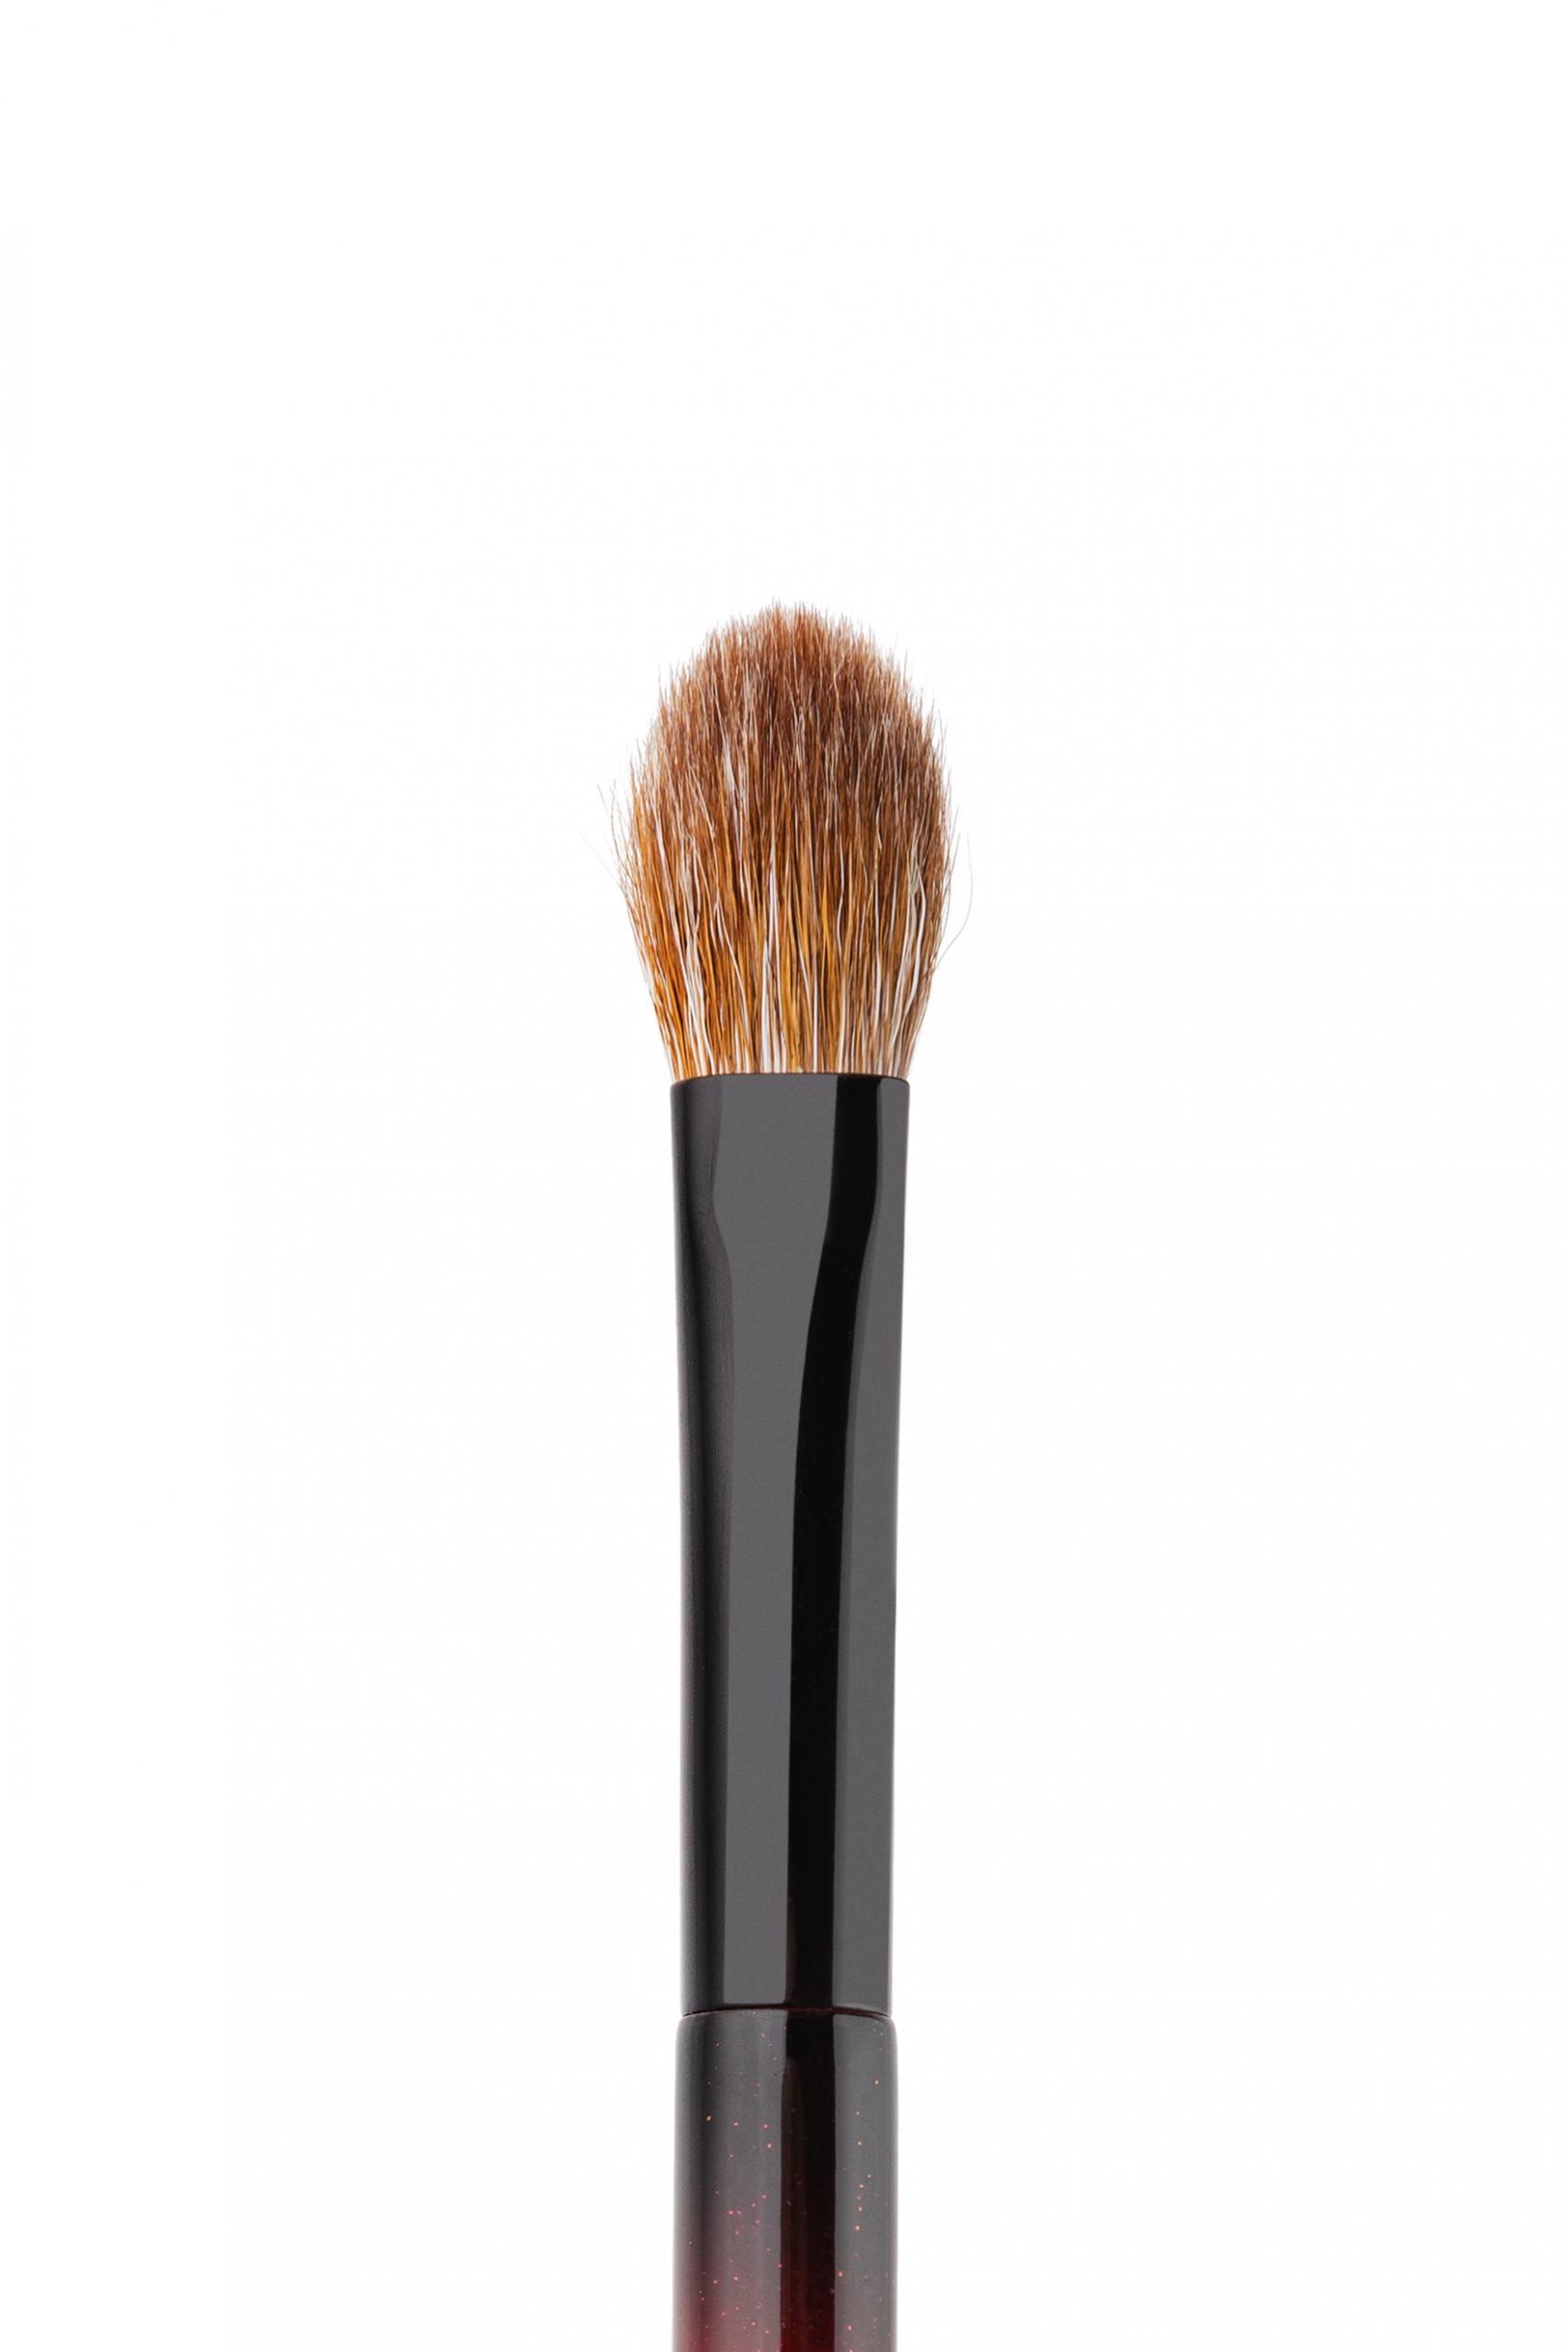 Photo bristles brushes for dry eyes Annbeauty STARS7